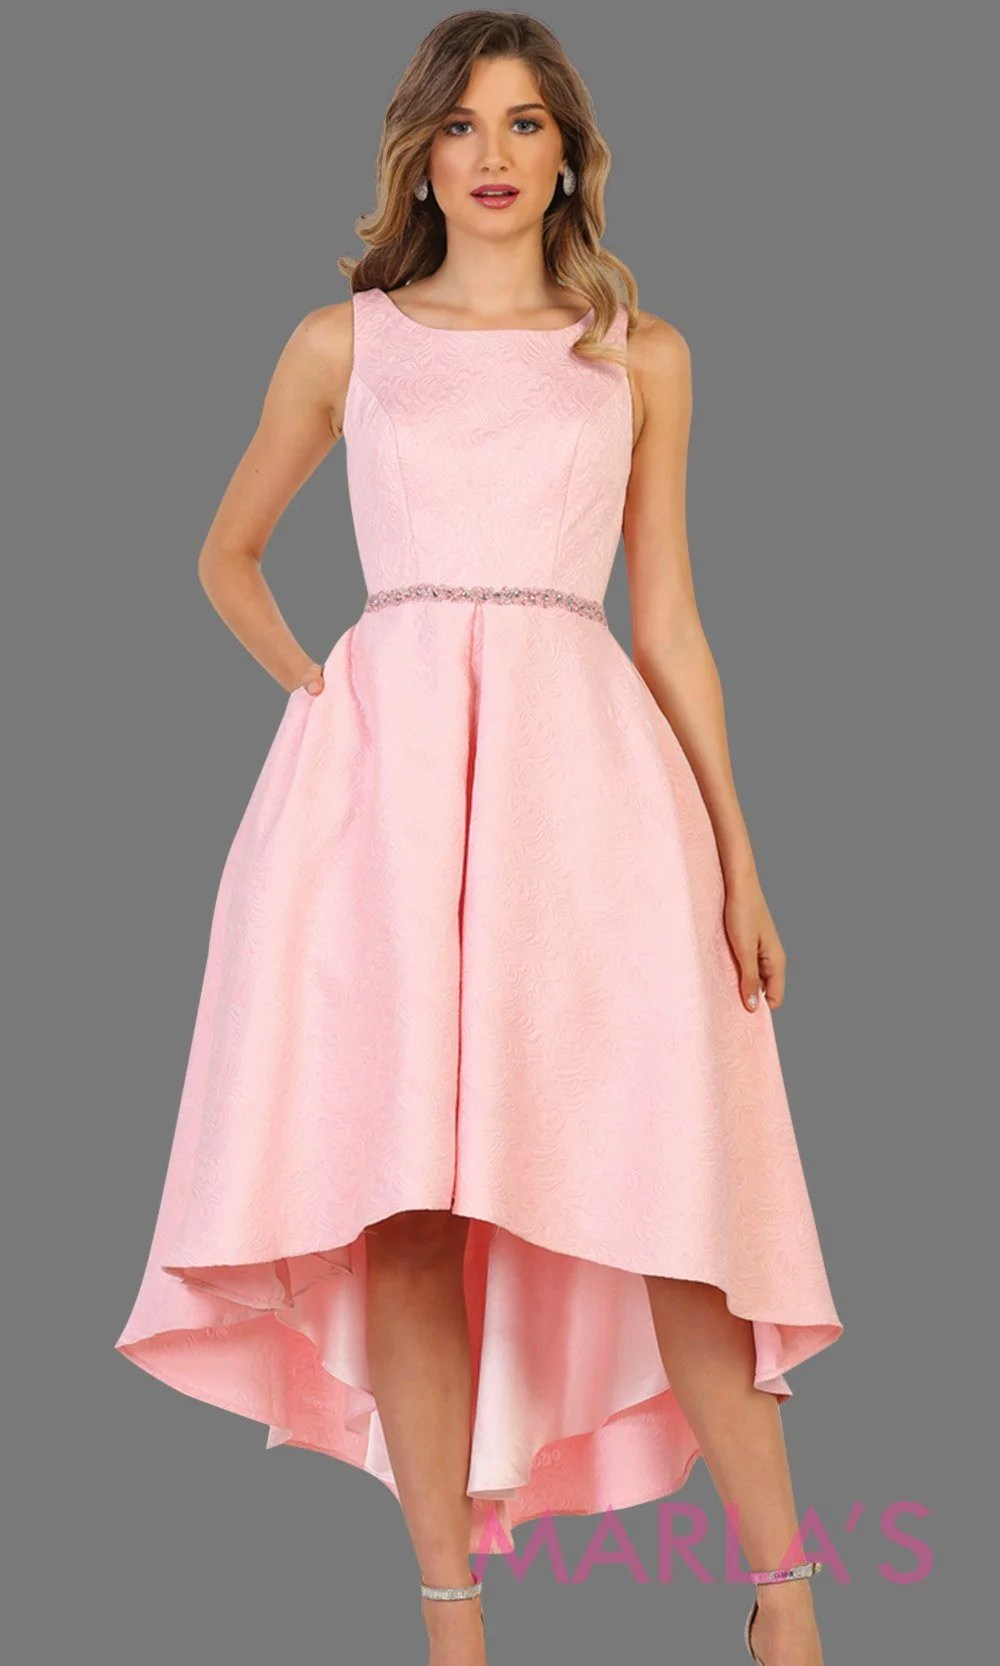 Plus Size Semi-Formal Wedding Guest Dress